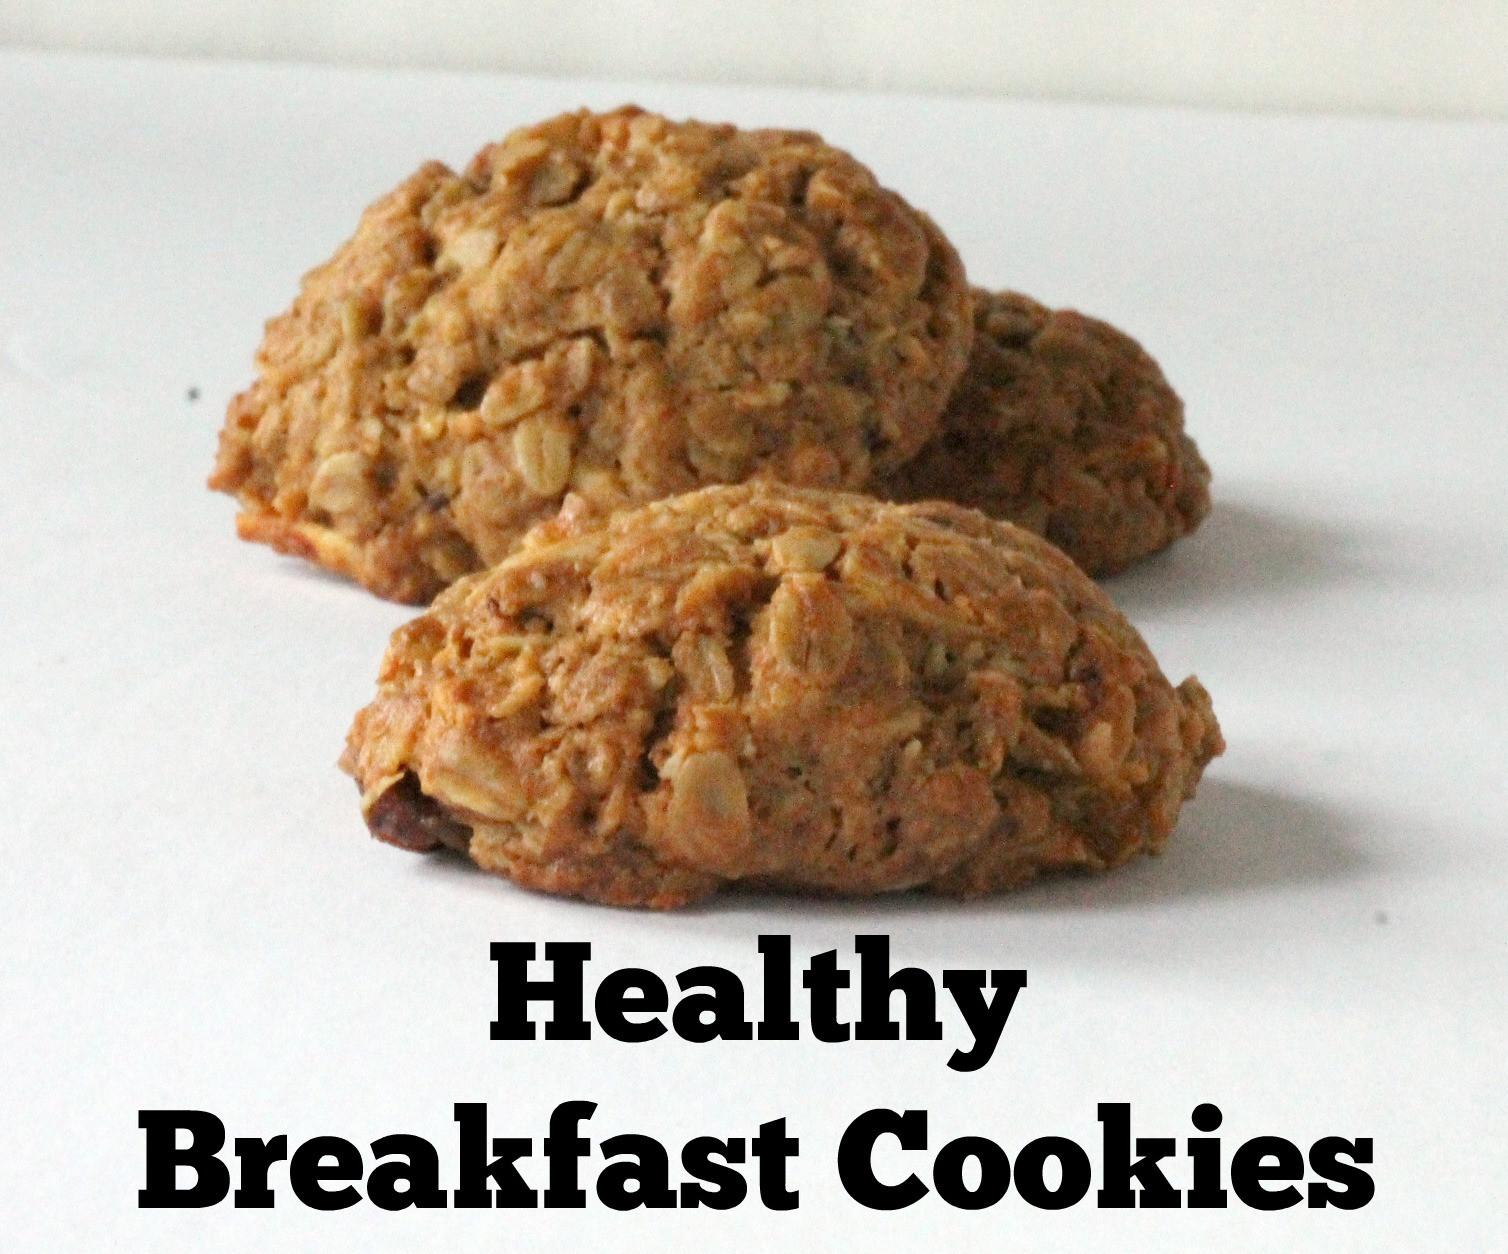 Healthy Breakfast Cookie  Healthy Breakfast Cookies — Cooking By LaptopCooking By Laptop